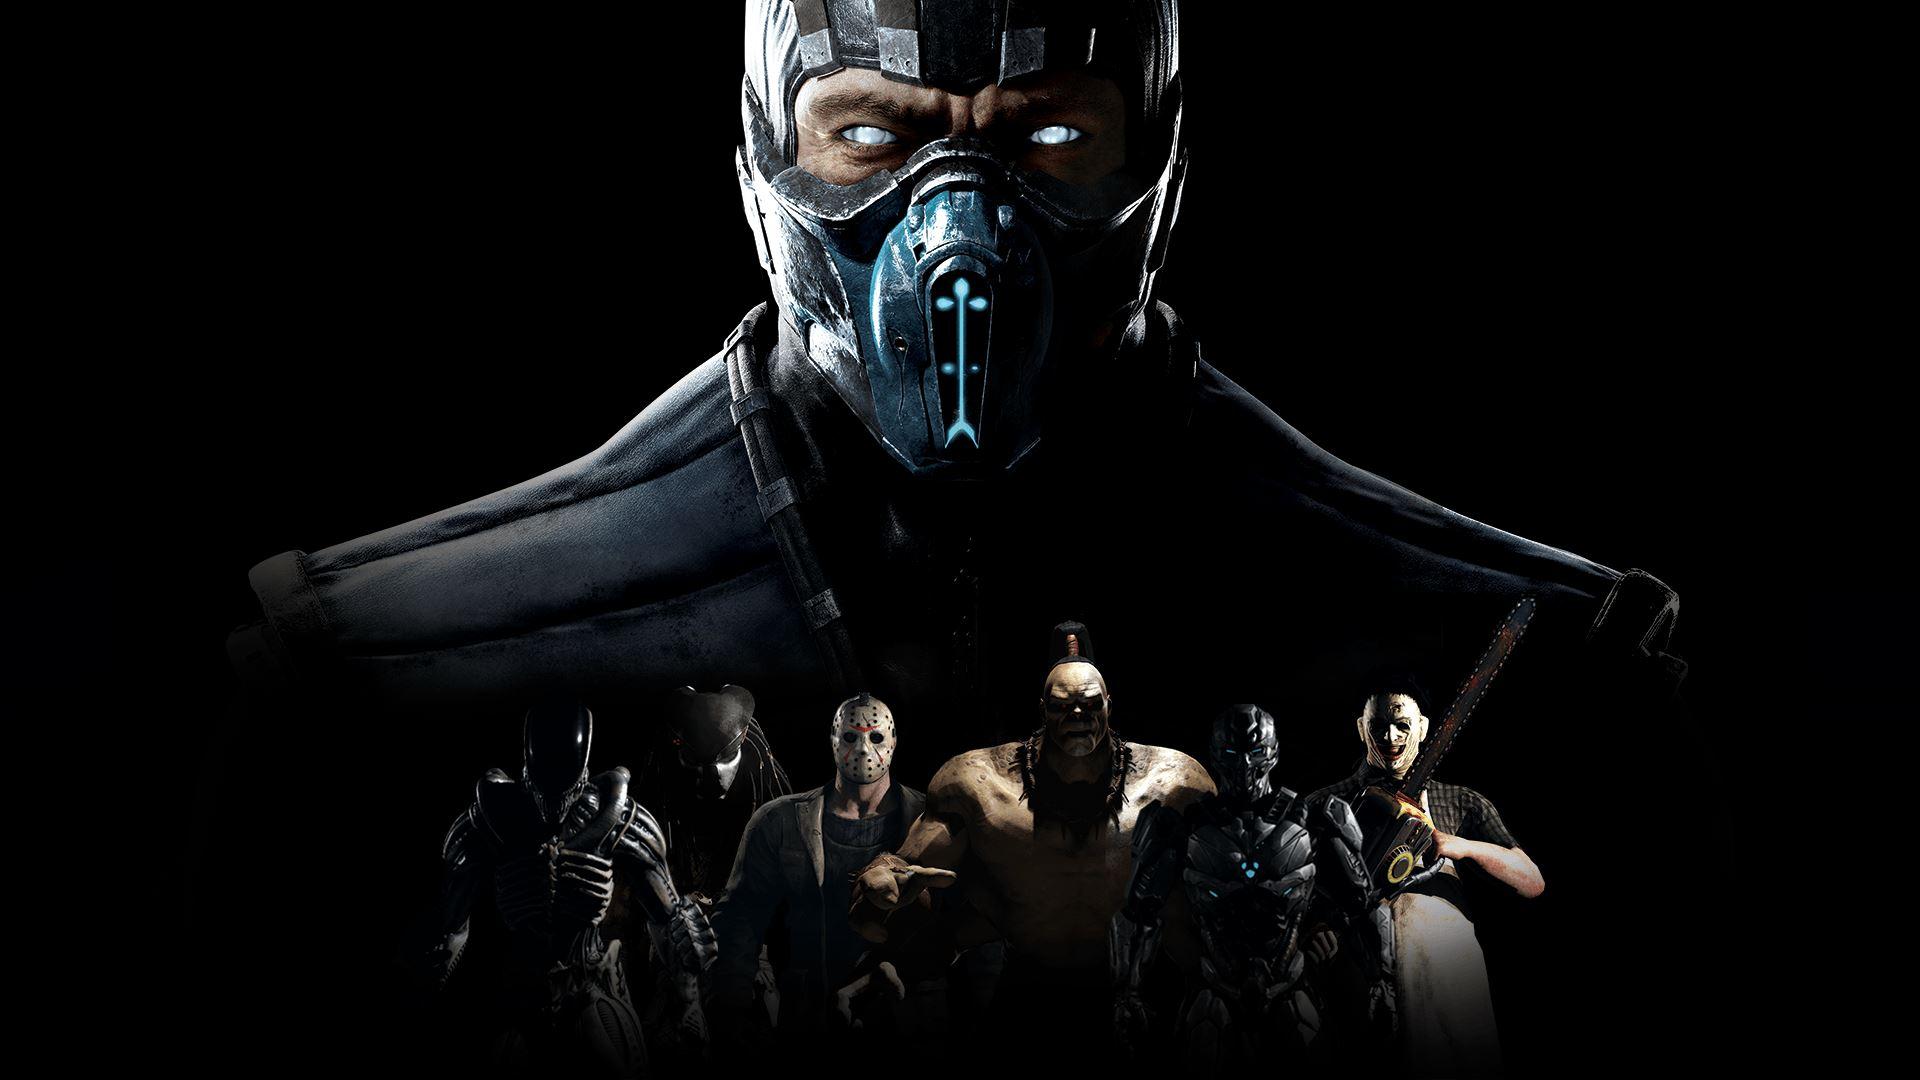 Mortal Kombat/Killer Instinct